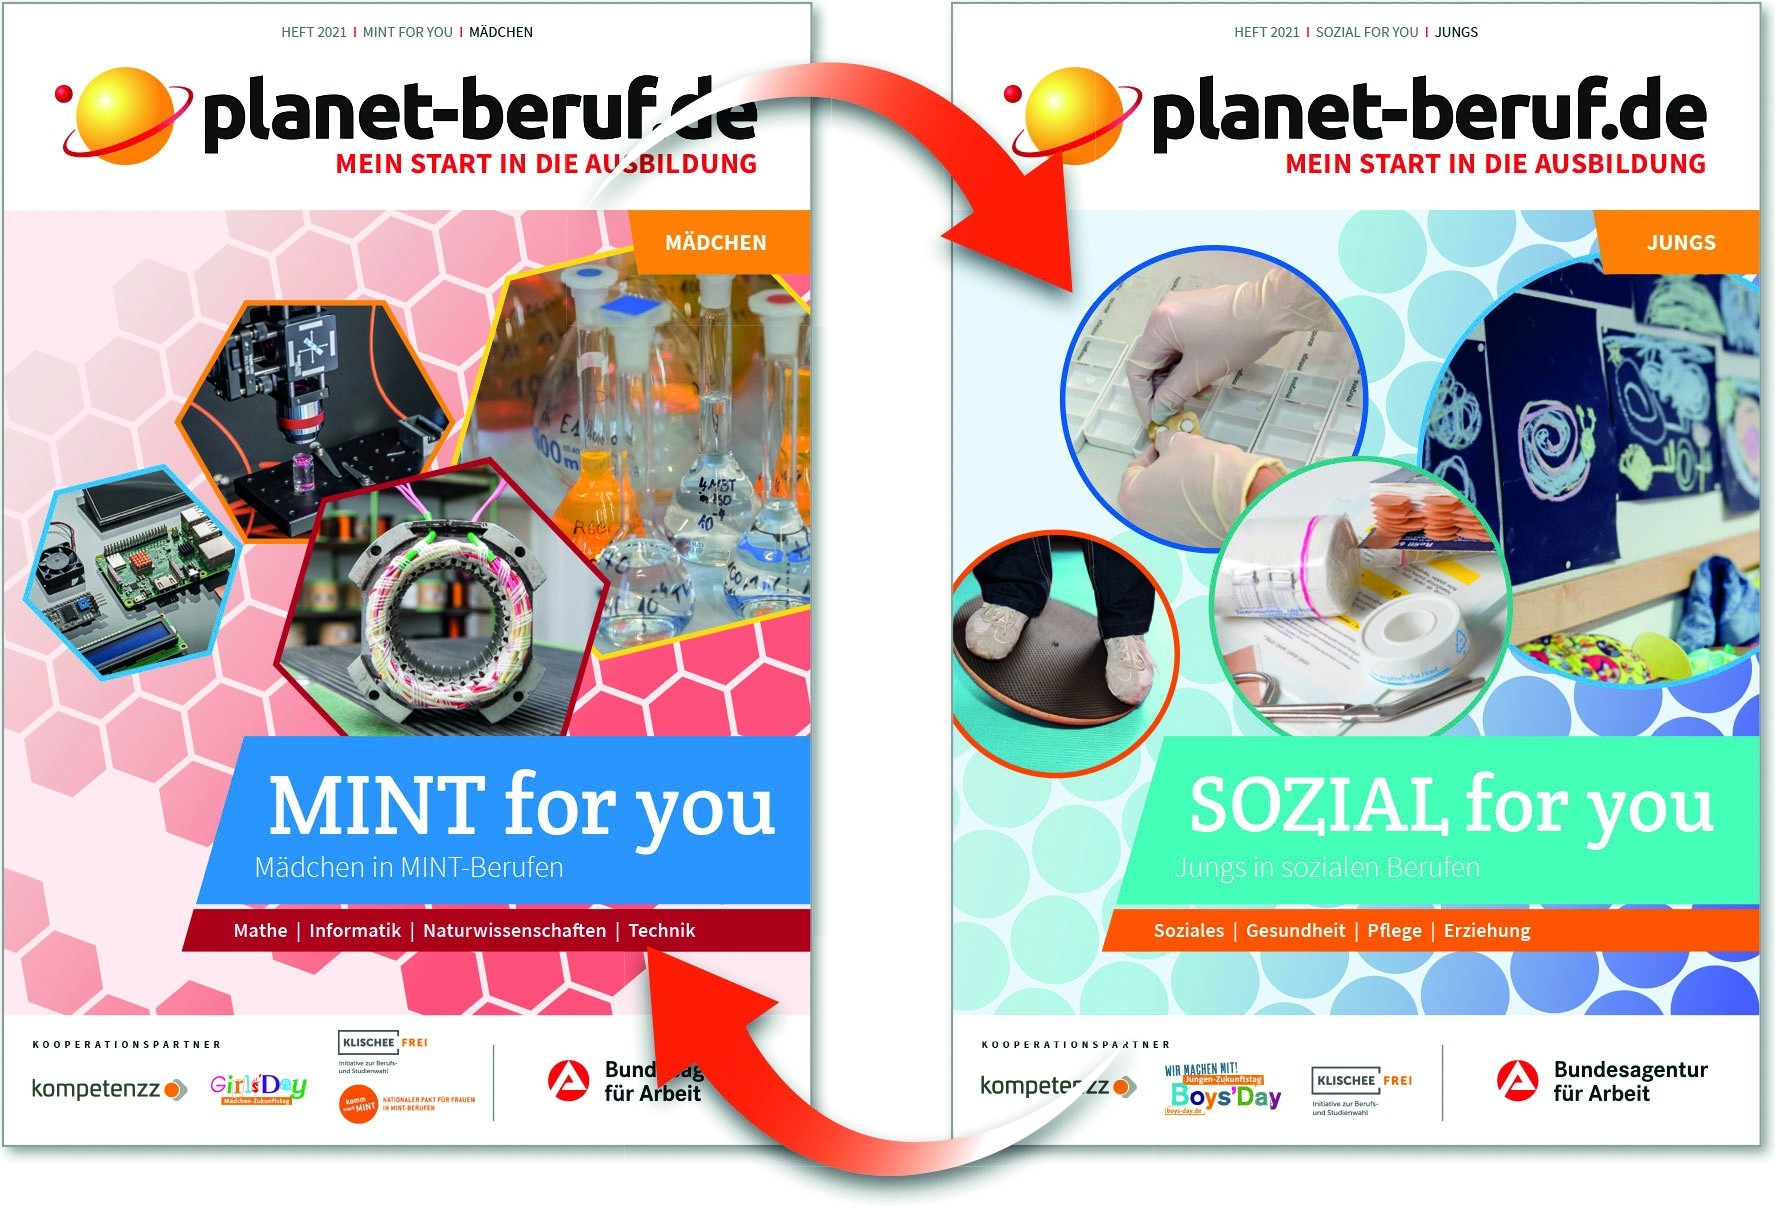 planet-beruf.de: MINT for you & SOZIAL for you | Wendeheft | Ausgabe 2021